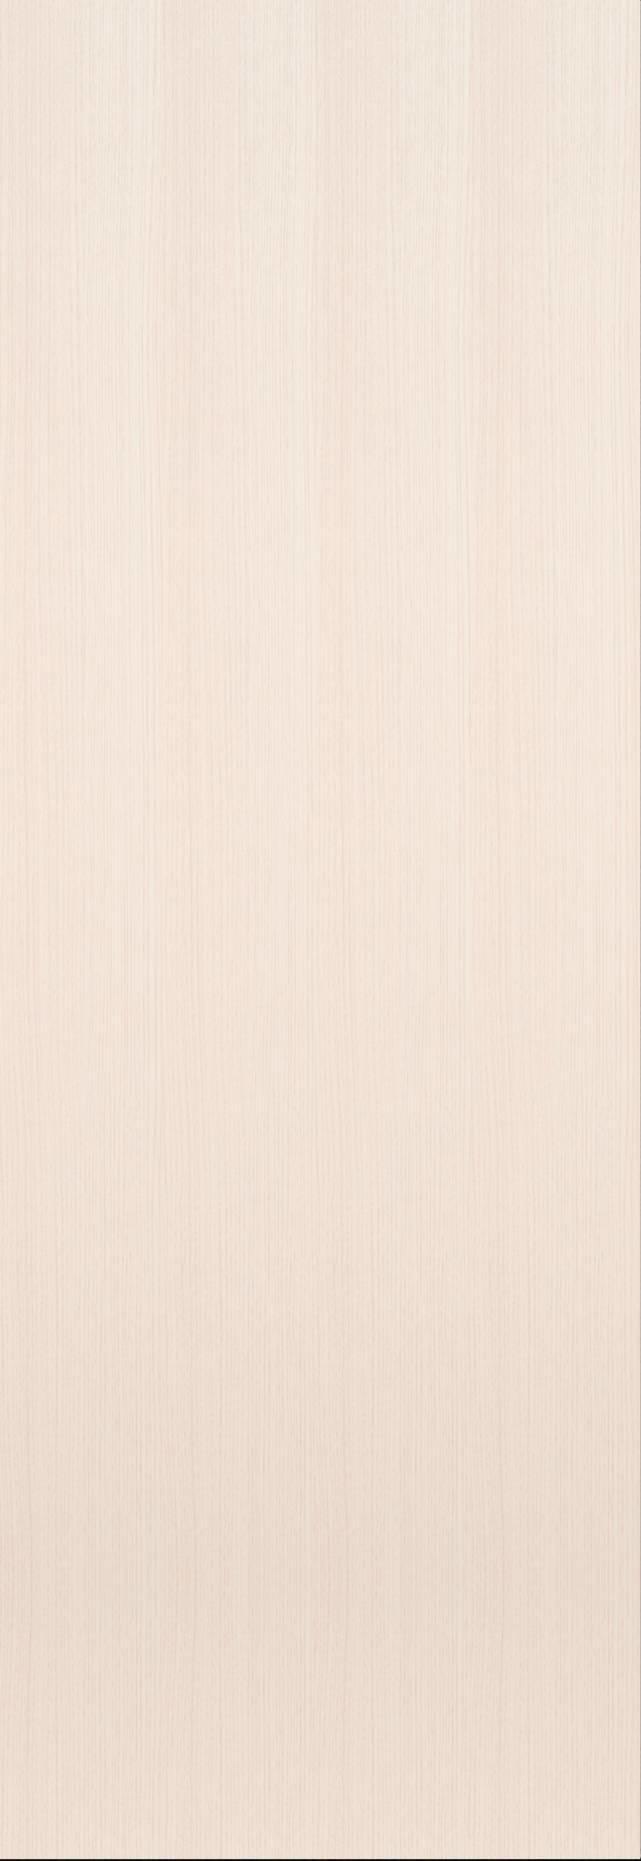 Tivoli А-1 Invisible цвет - Беленый дуб Без стекла (ДГ)